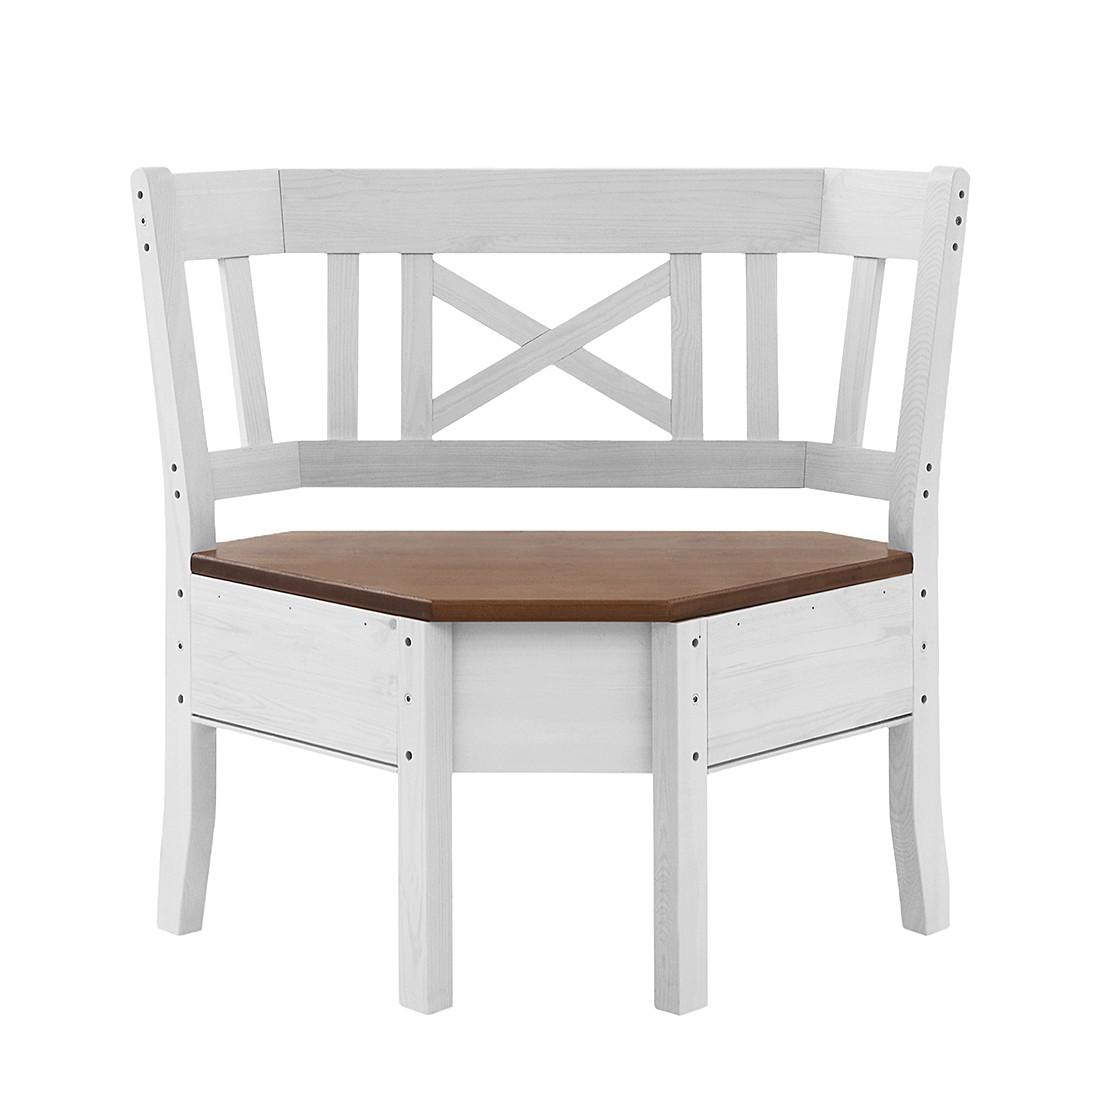 vernis cp2016 brillant 1l25 durcisseur inclus. Black Bedroom Furniture Sets. Home Design Ideas